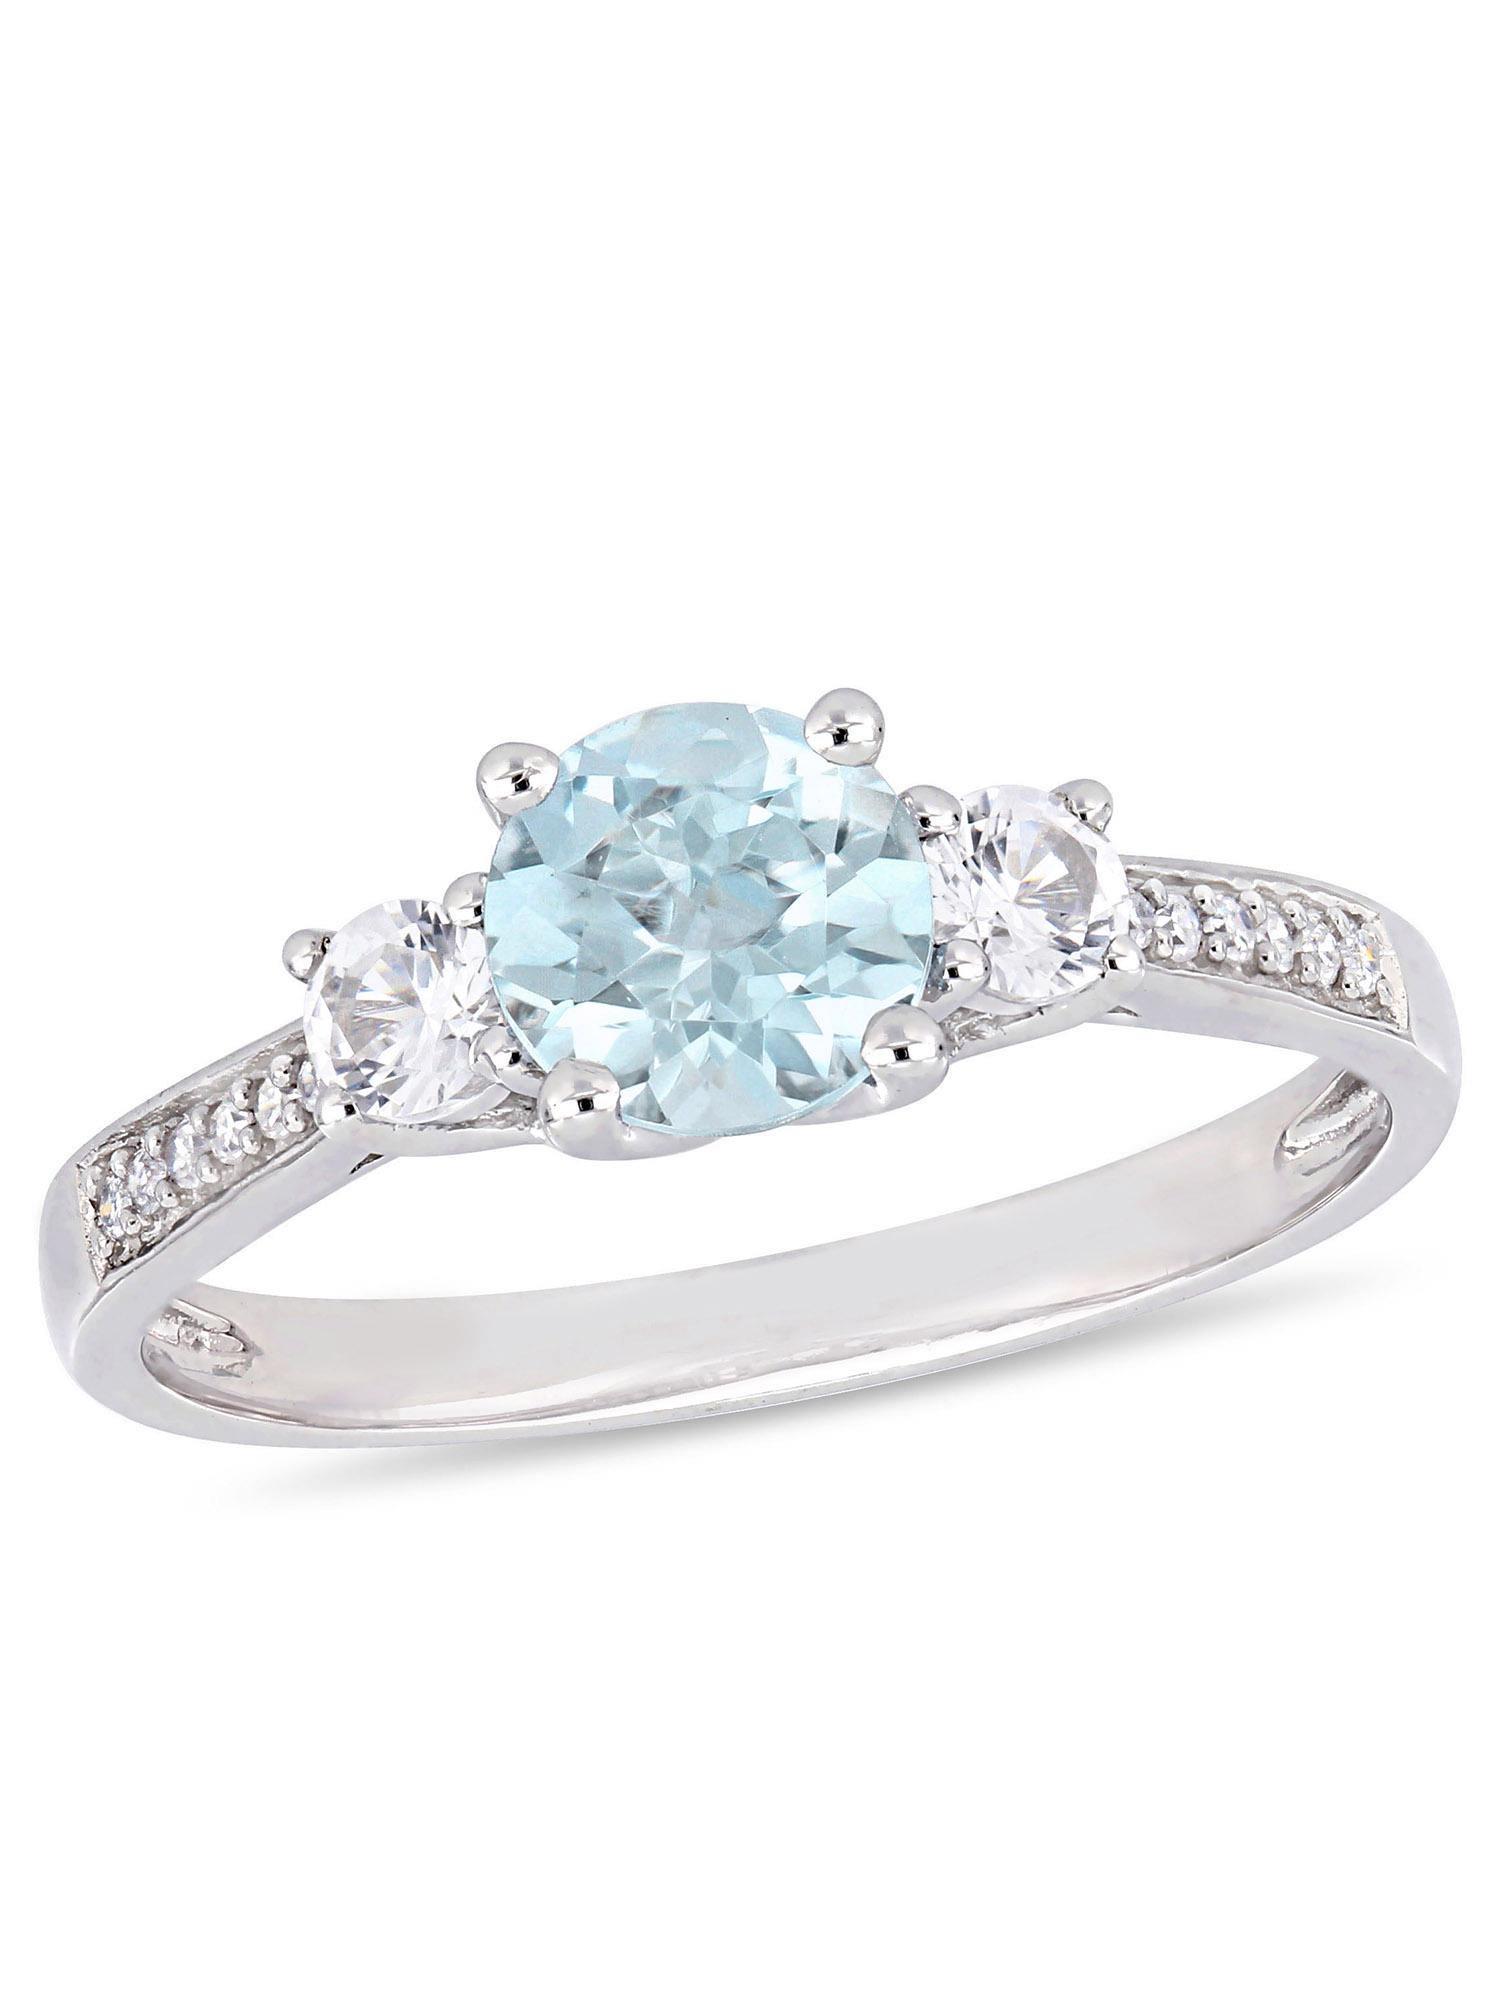 Tangelo 1 Carat T.G.W. Aquamarine, Created White Sapphire and Diamond-Accent 10kt White Gold Three-Stone Engagement Ring